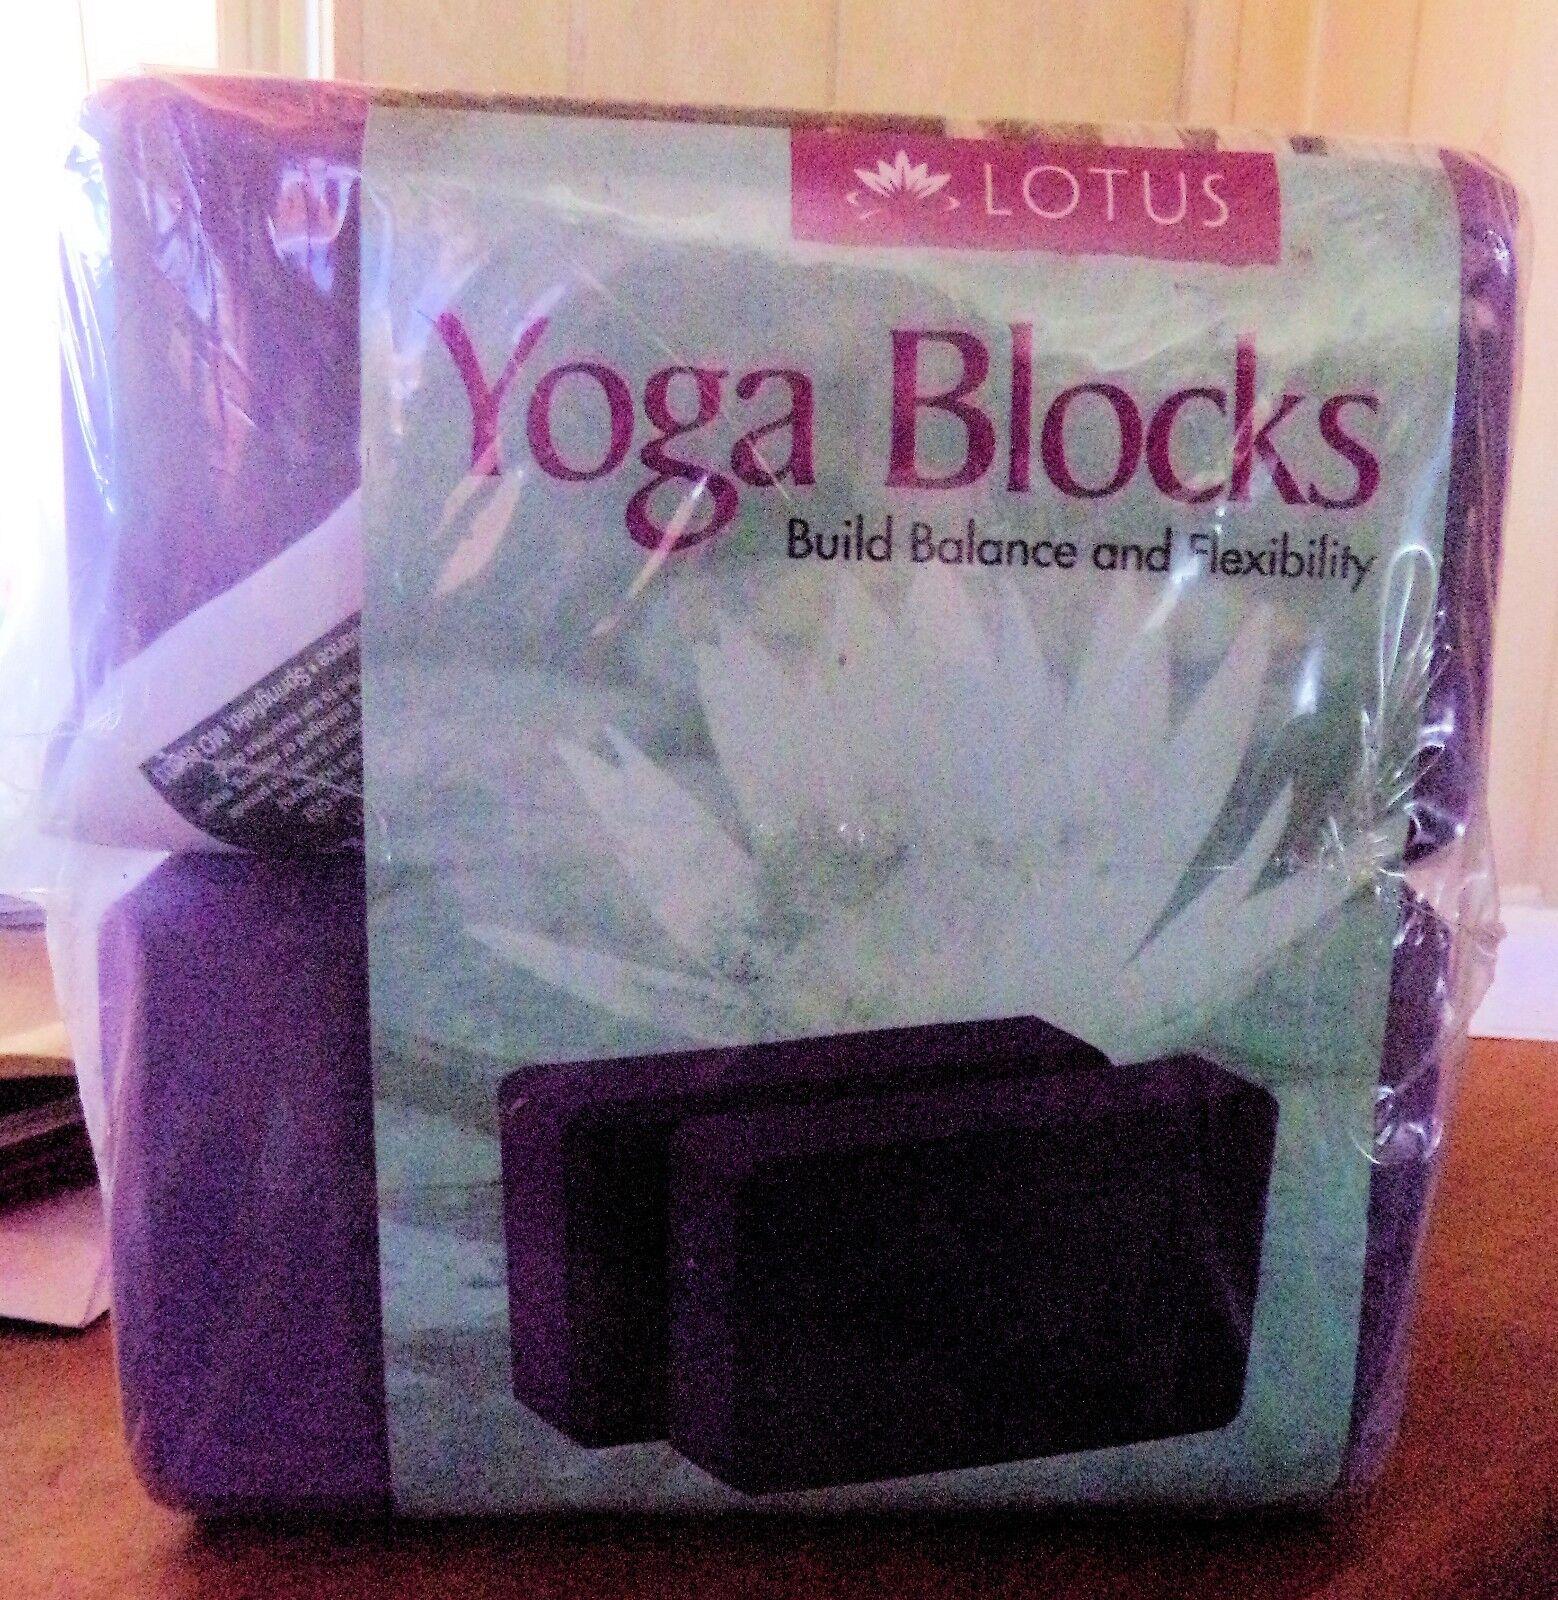 Lotus Yoga Blocks Foam 2 Pack Purple-Build Balance and Flexi